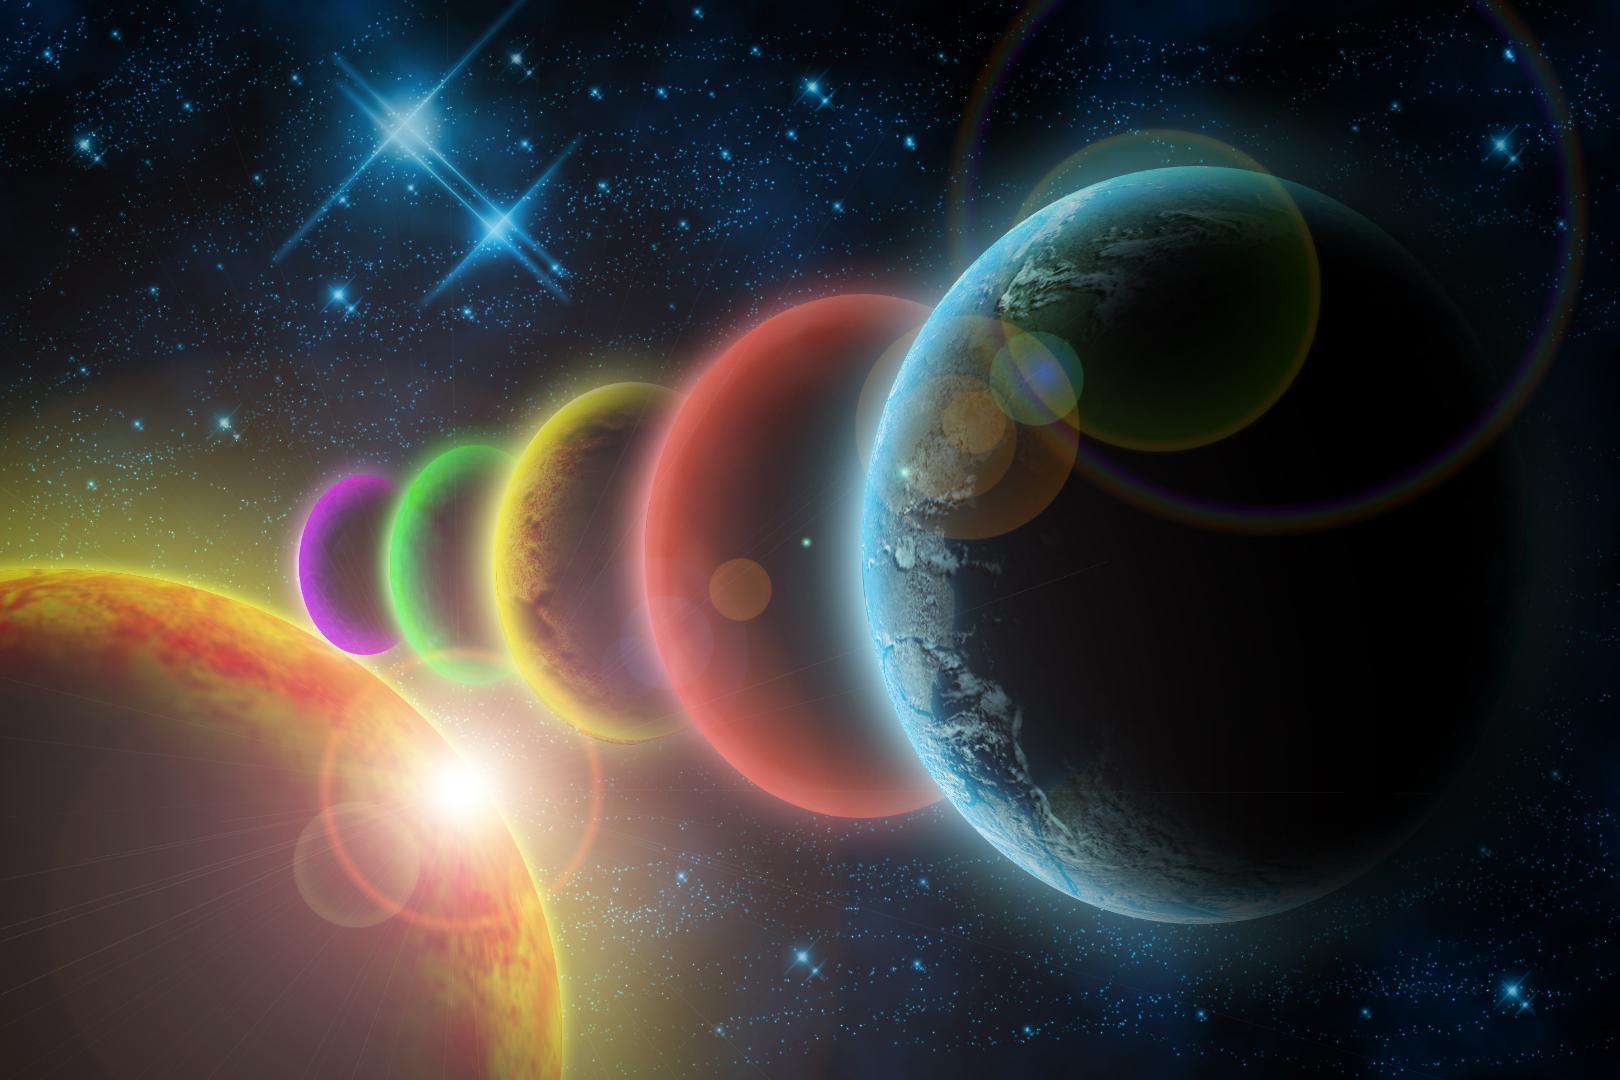 543731_kosmos_3d_art_1620x1080_(www.GetBg.net)